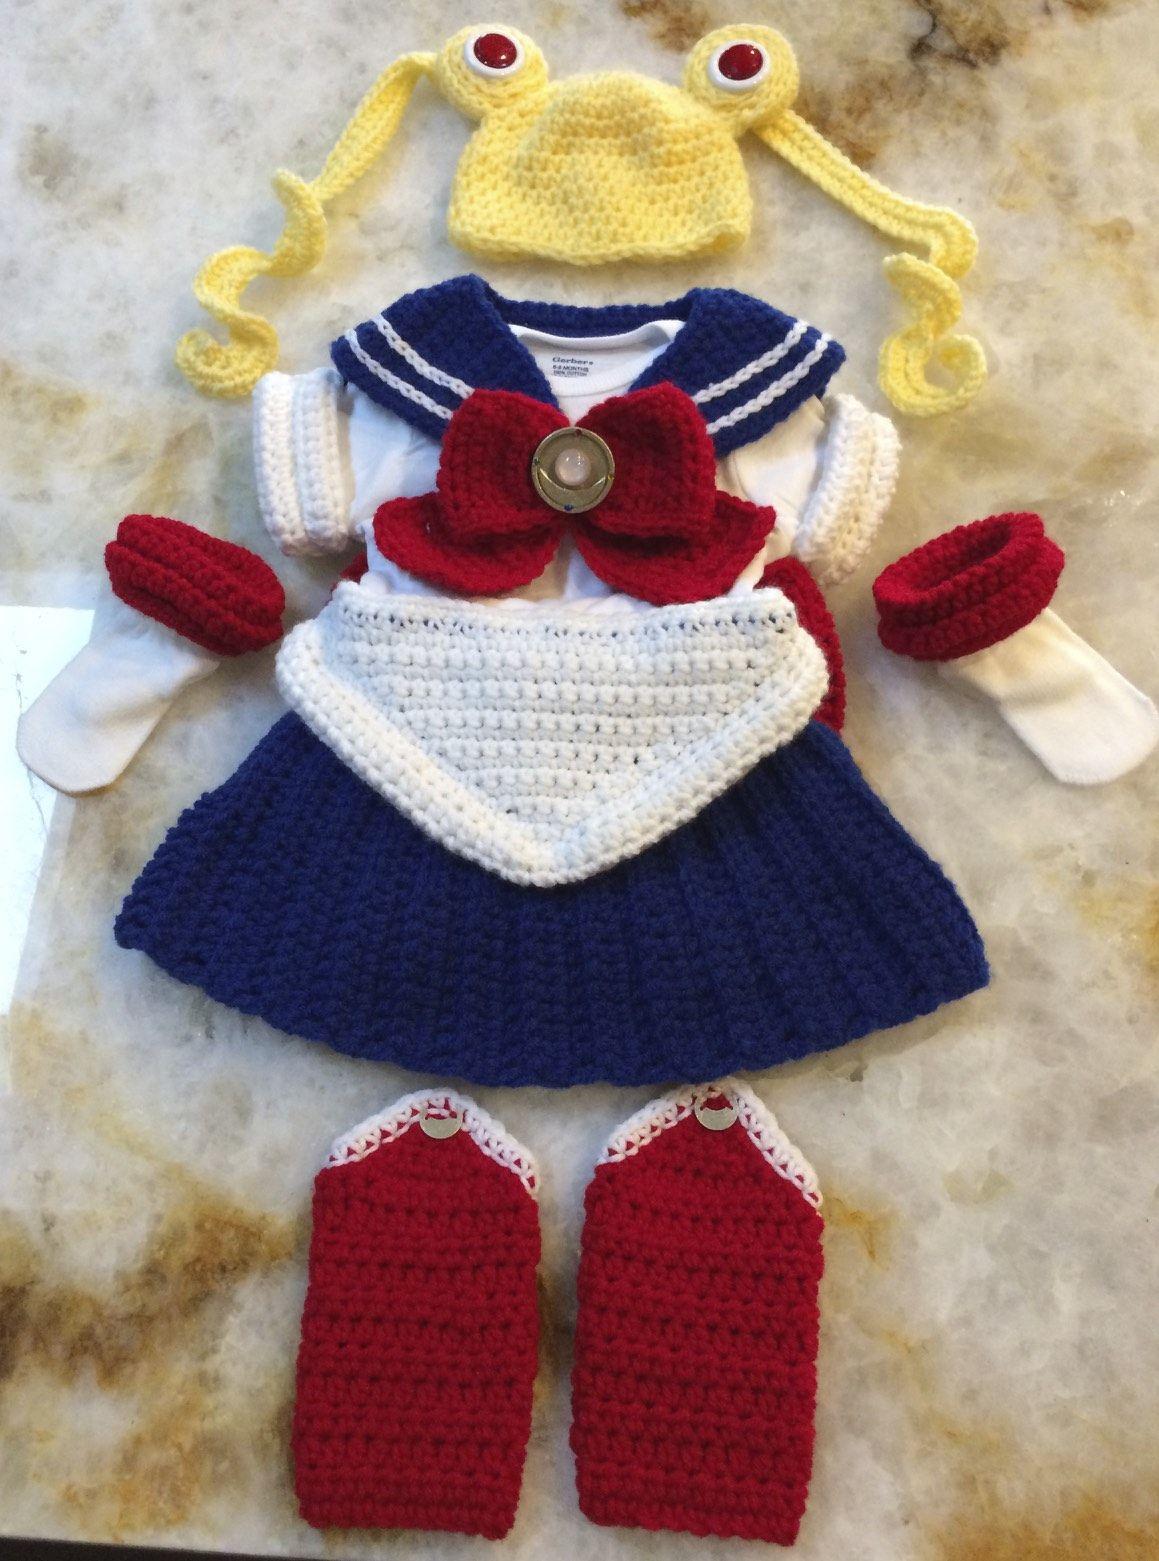 Crocheted Sailor Moon Outfit | CROCHET | Pinterest ...